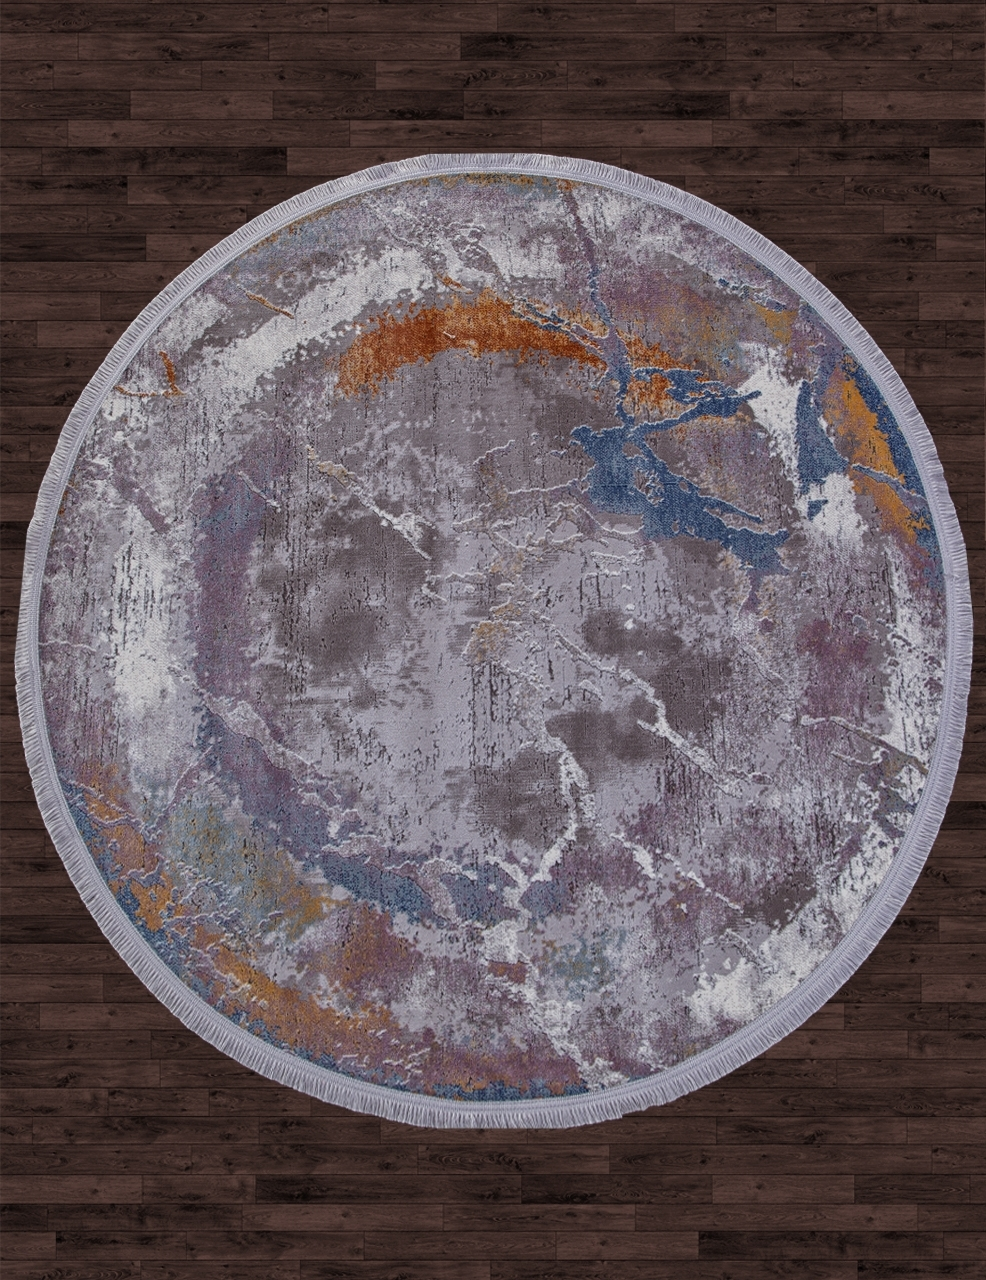 Ковер 05708G - GREY / GREY - Овал - коллекция RIM - фото 1